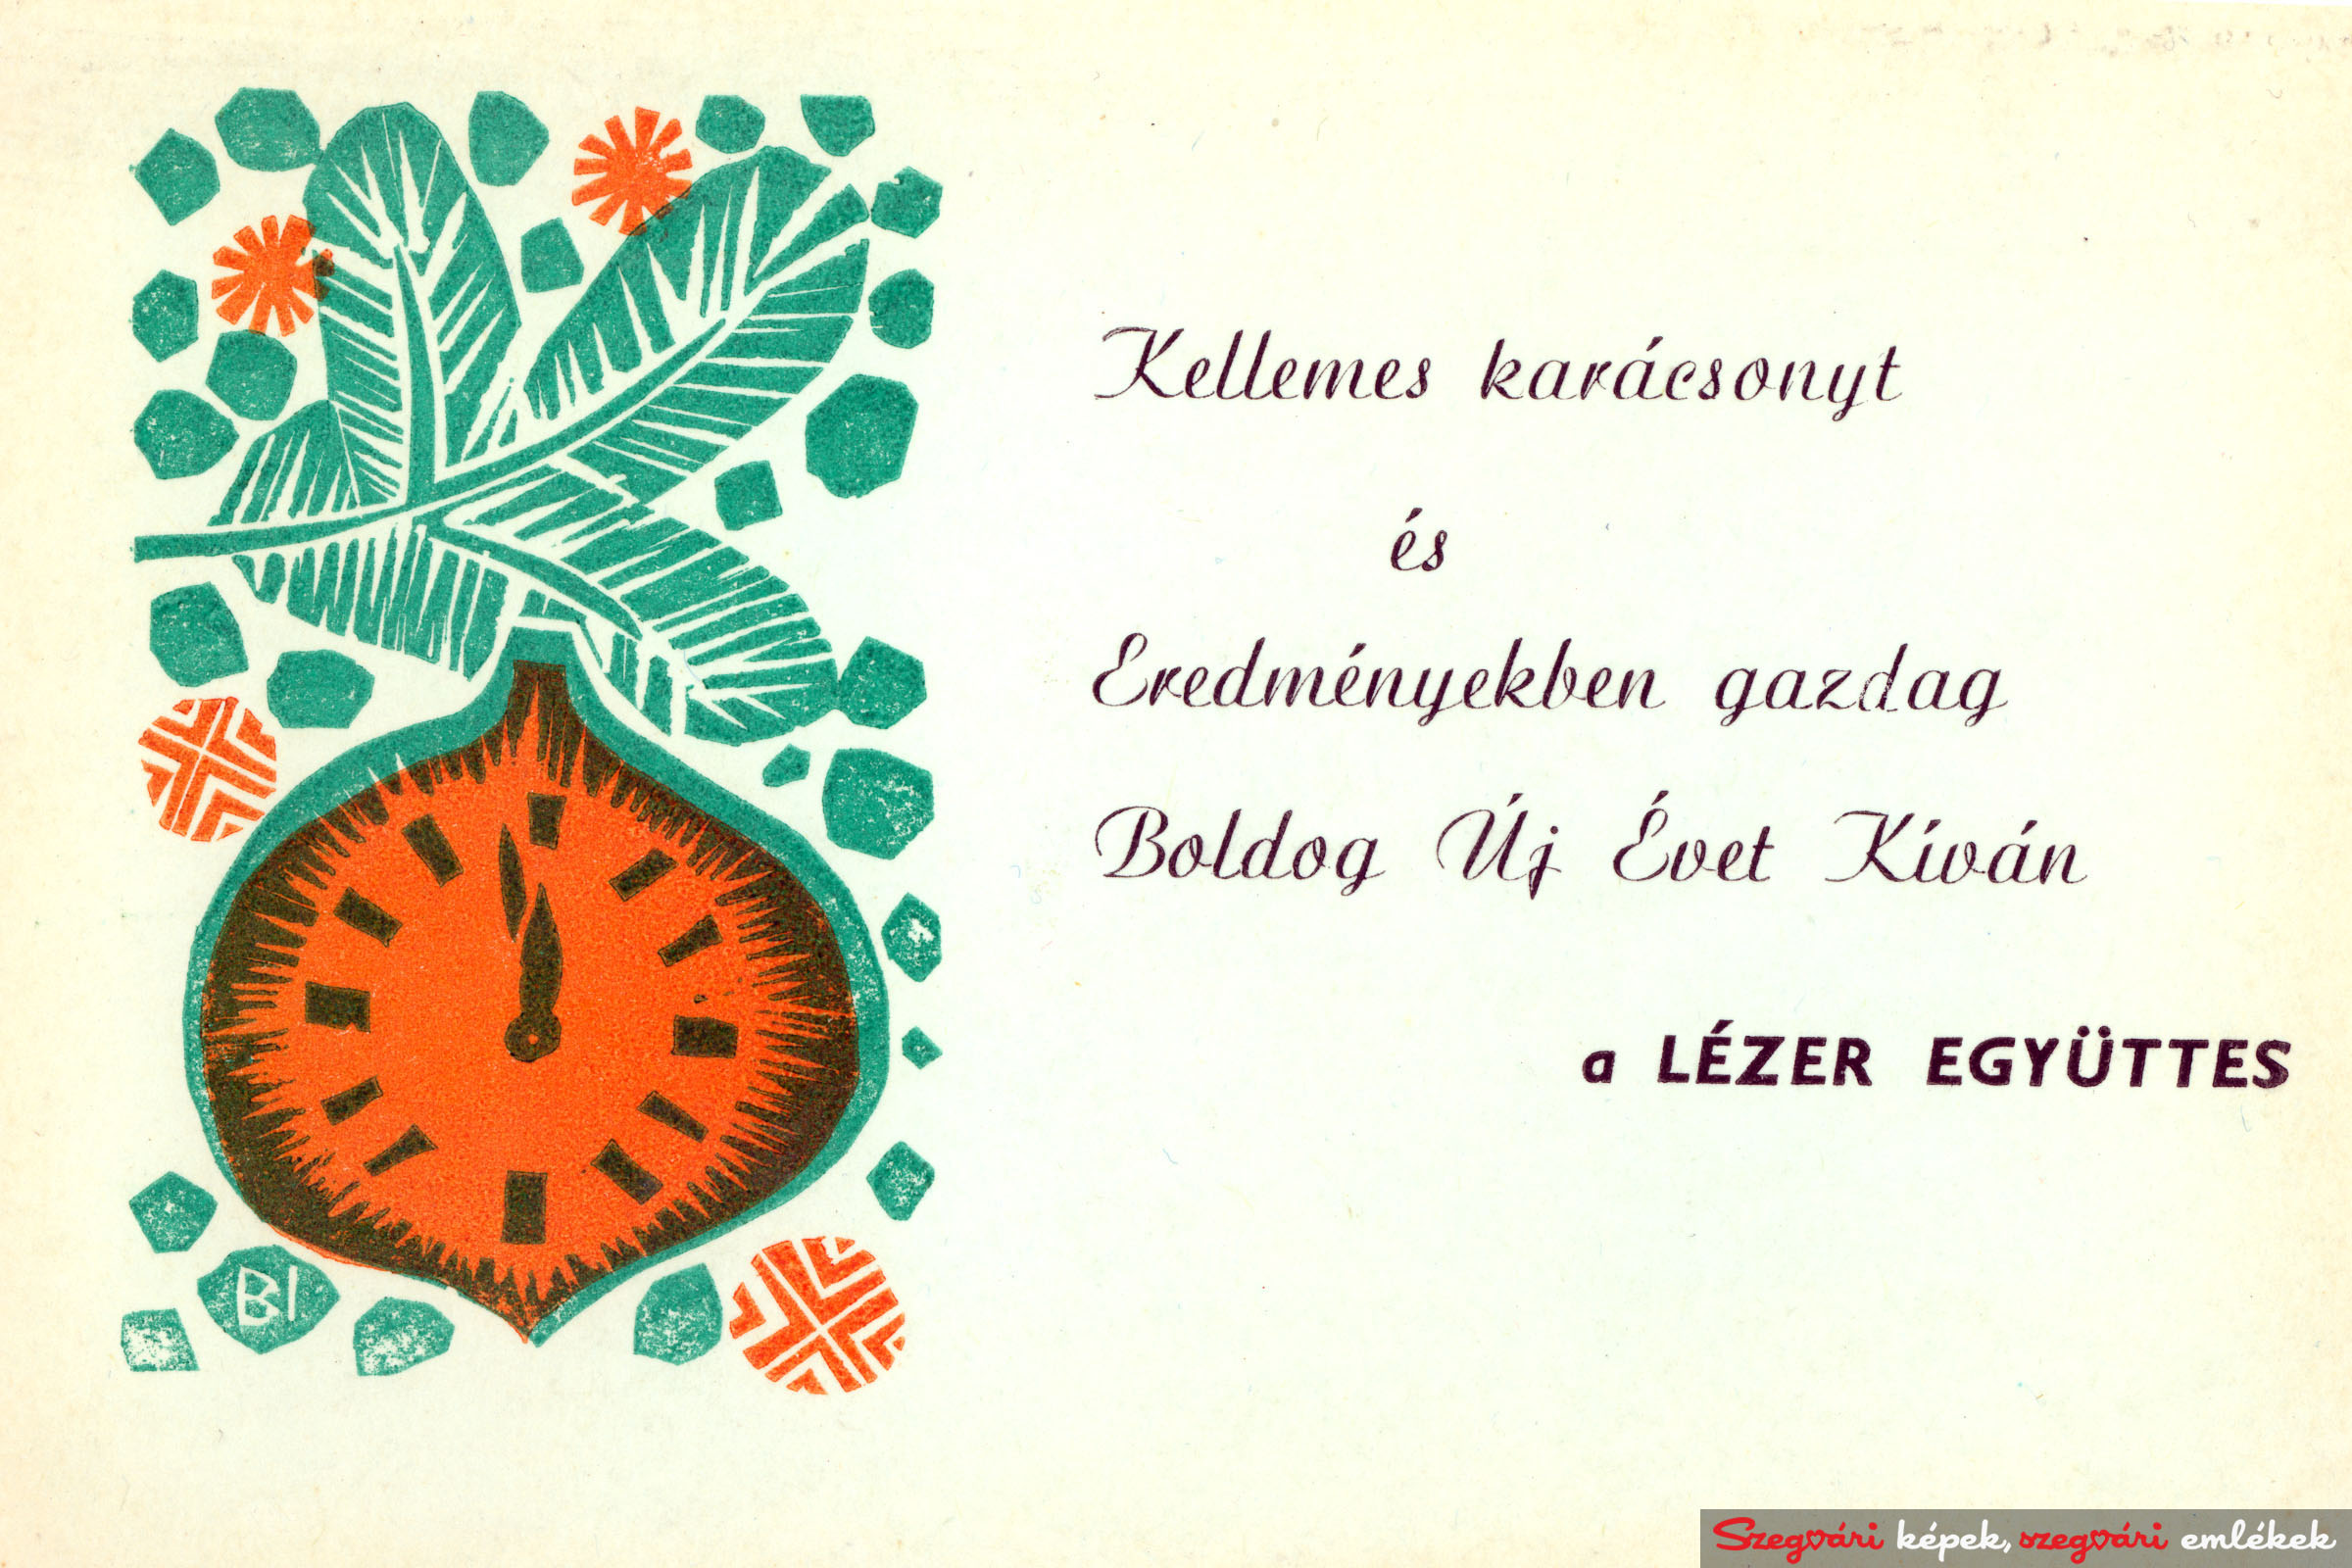 064 Lézer Rock 1980-1983. 007 – Fekete tulipántól a Lézerig,